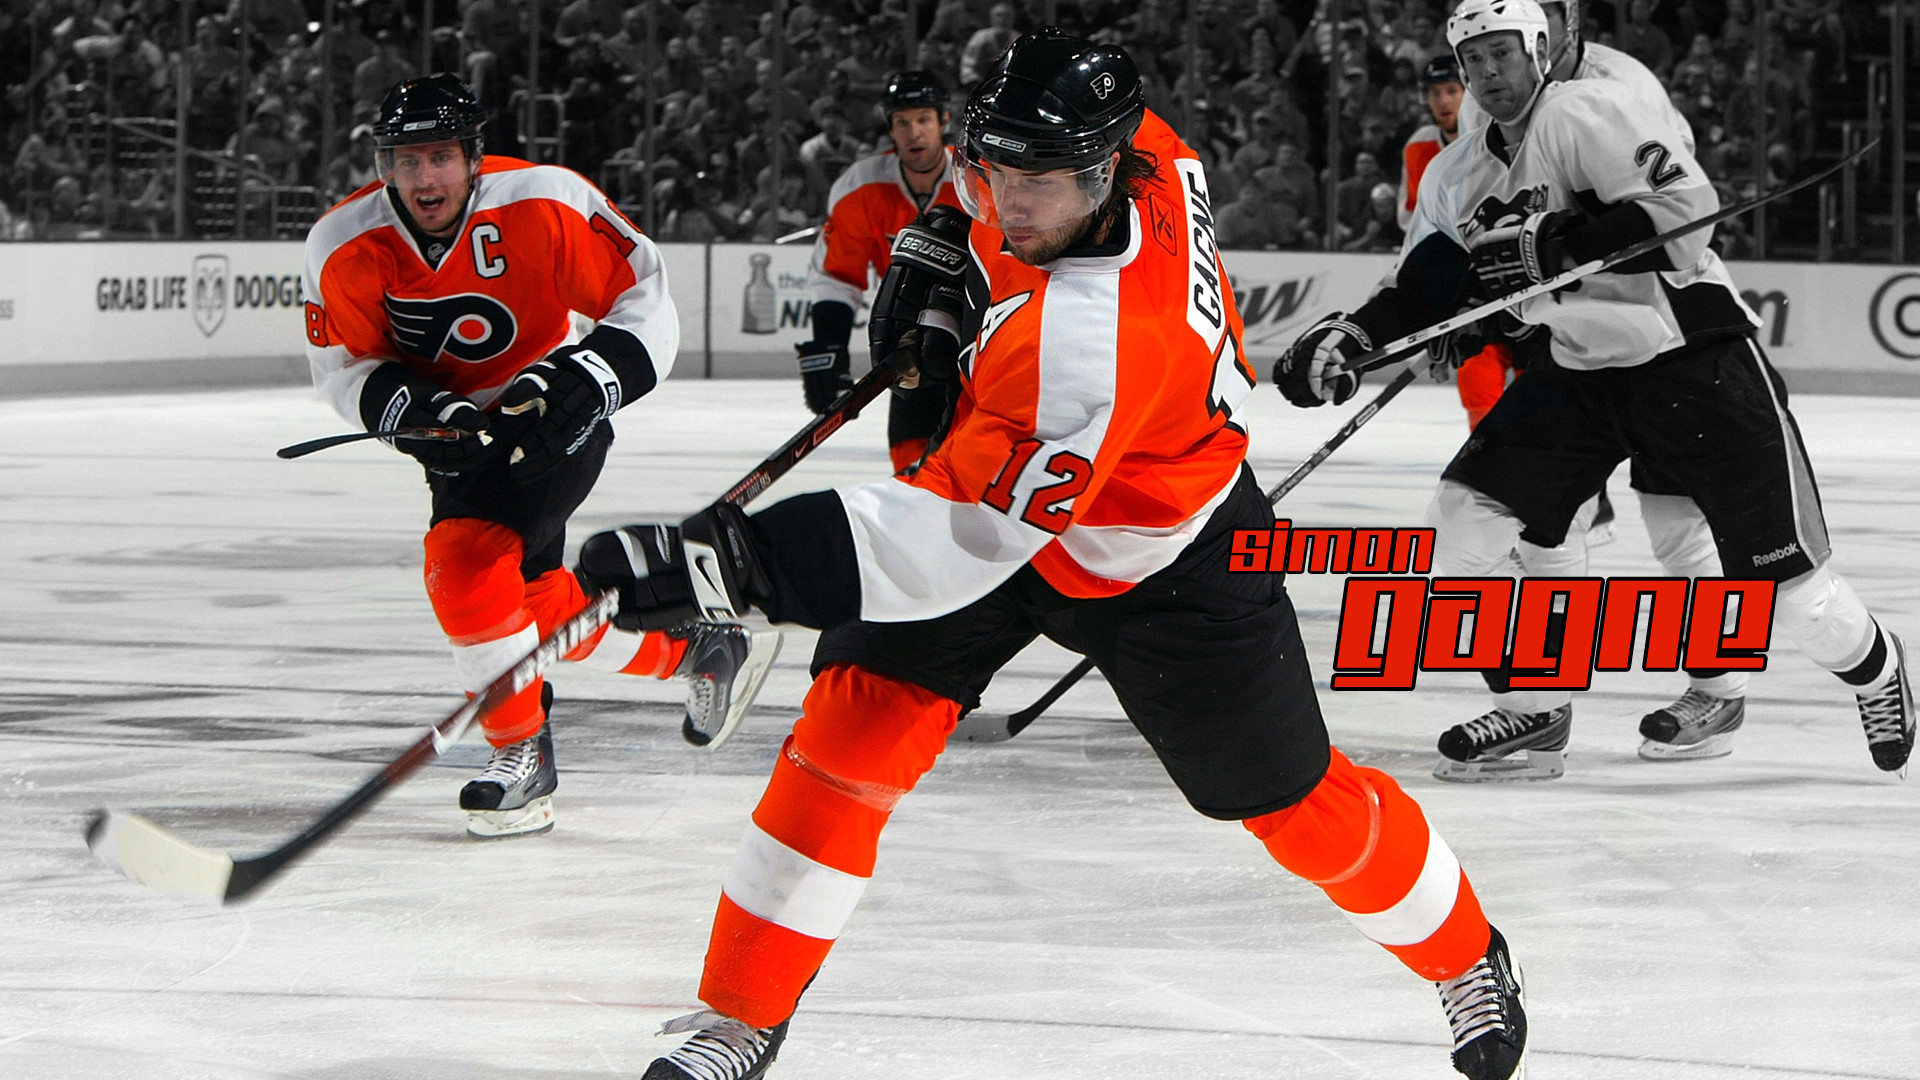 3D national hockey league NHL HD Wallpapers, Free HD wallpapers, Simon  Gagne, Philadelphia, Flyers